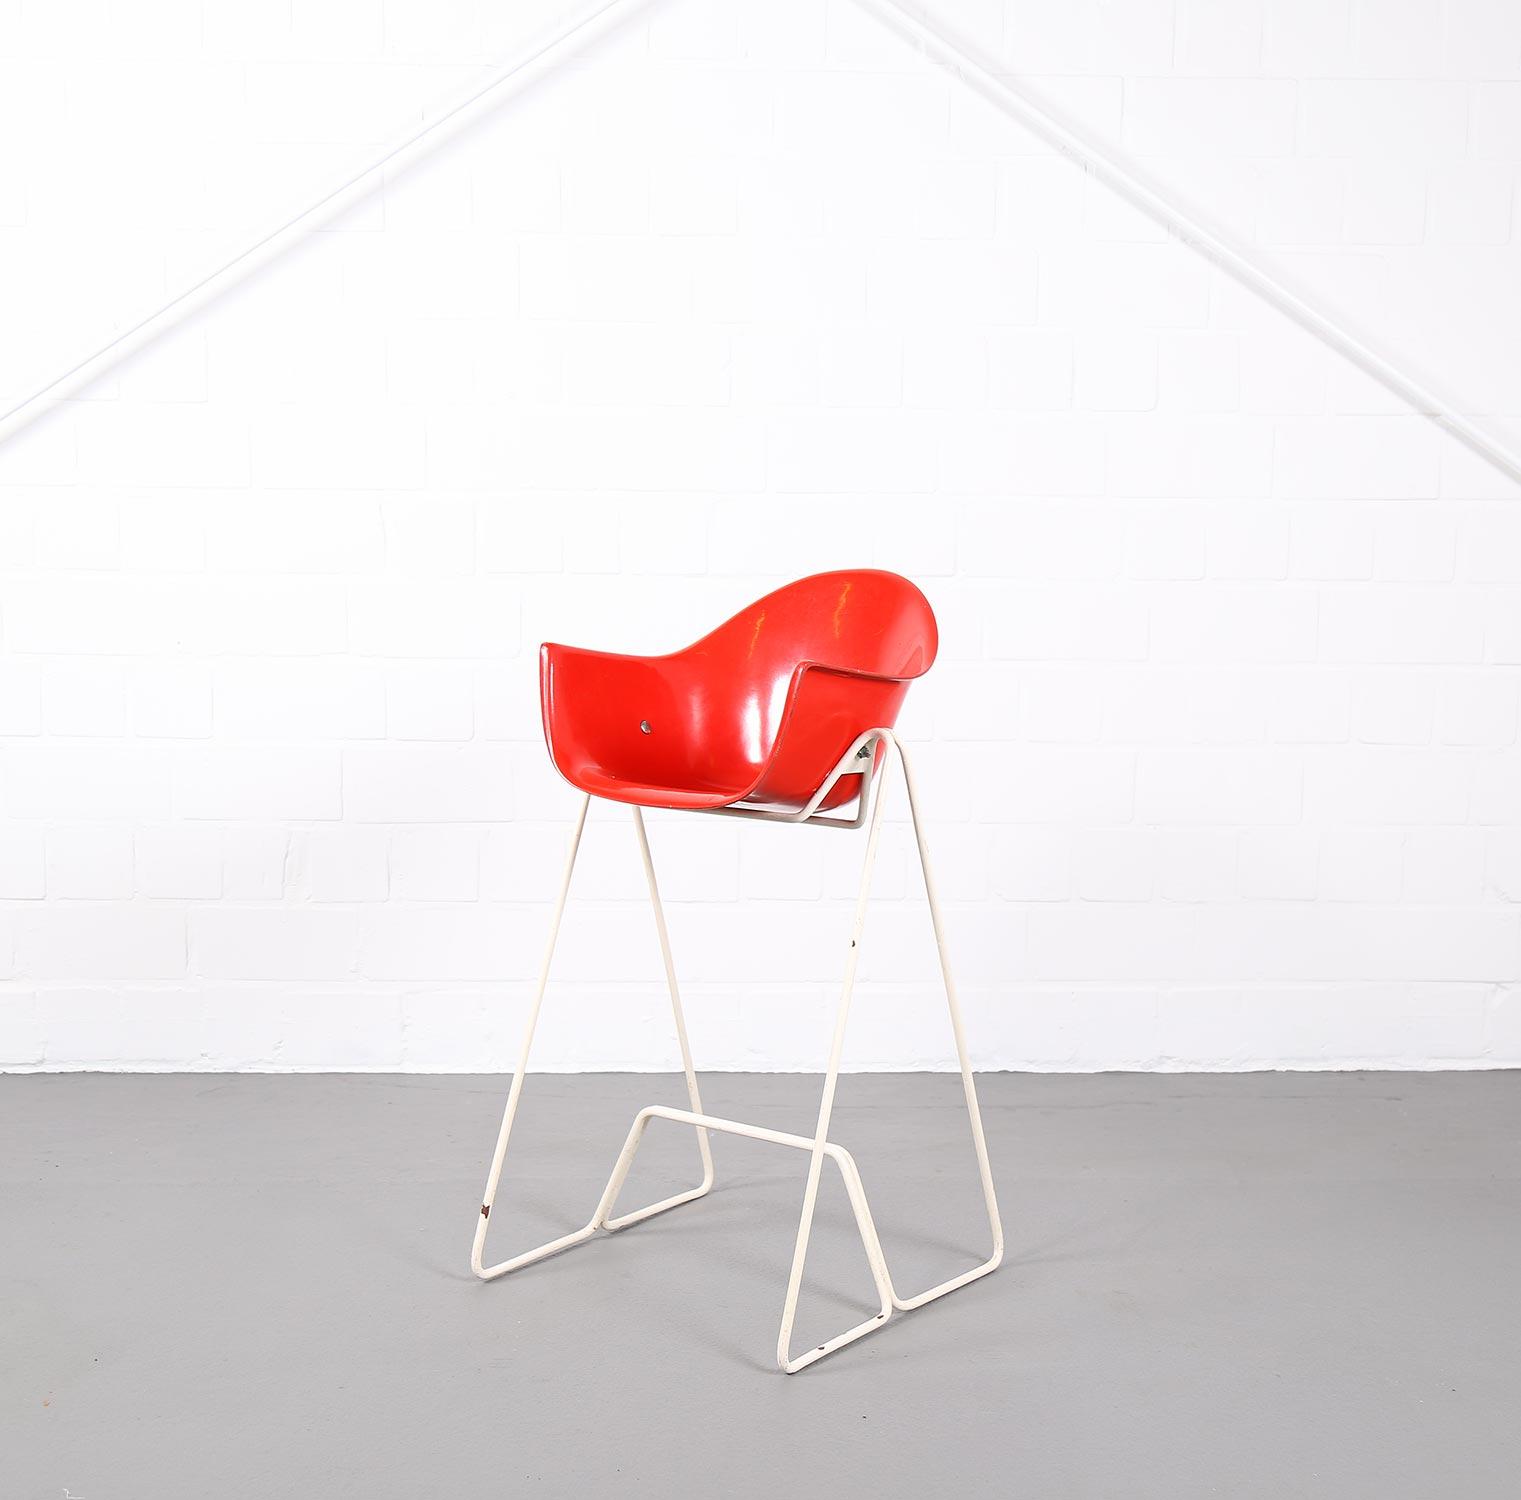 Vitra Eames Plastic Chair Gebraucht Bb italia official store